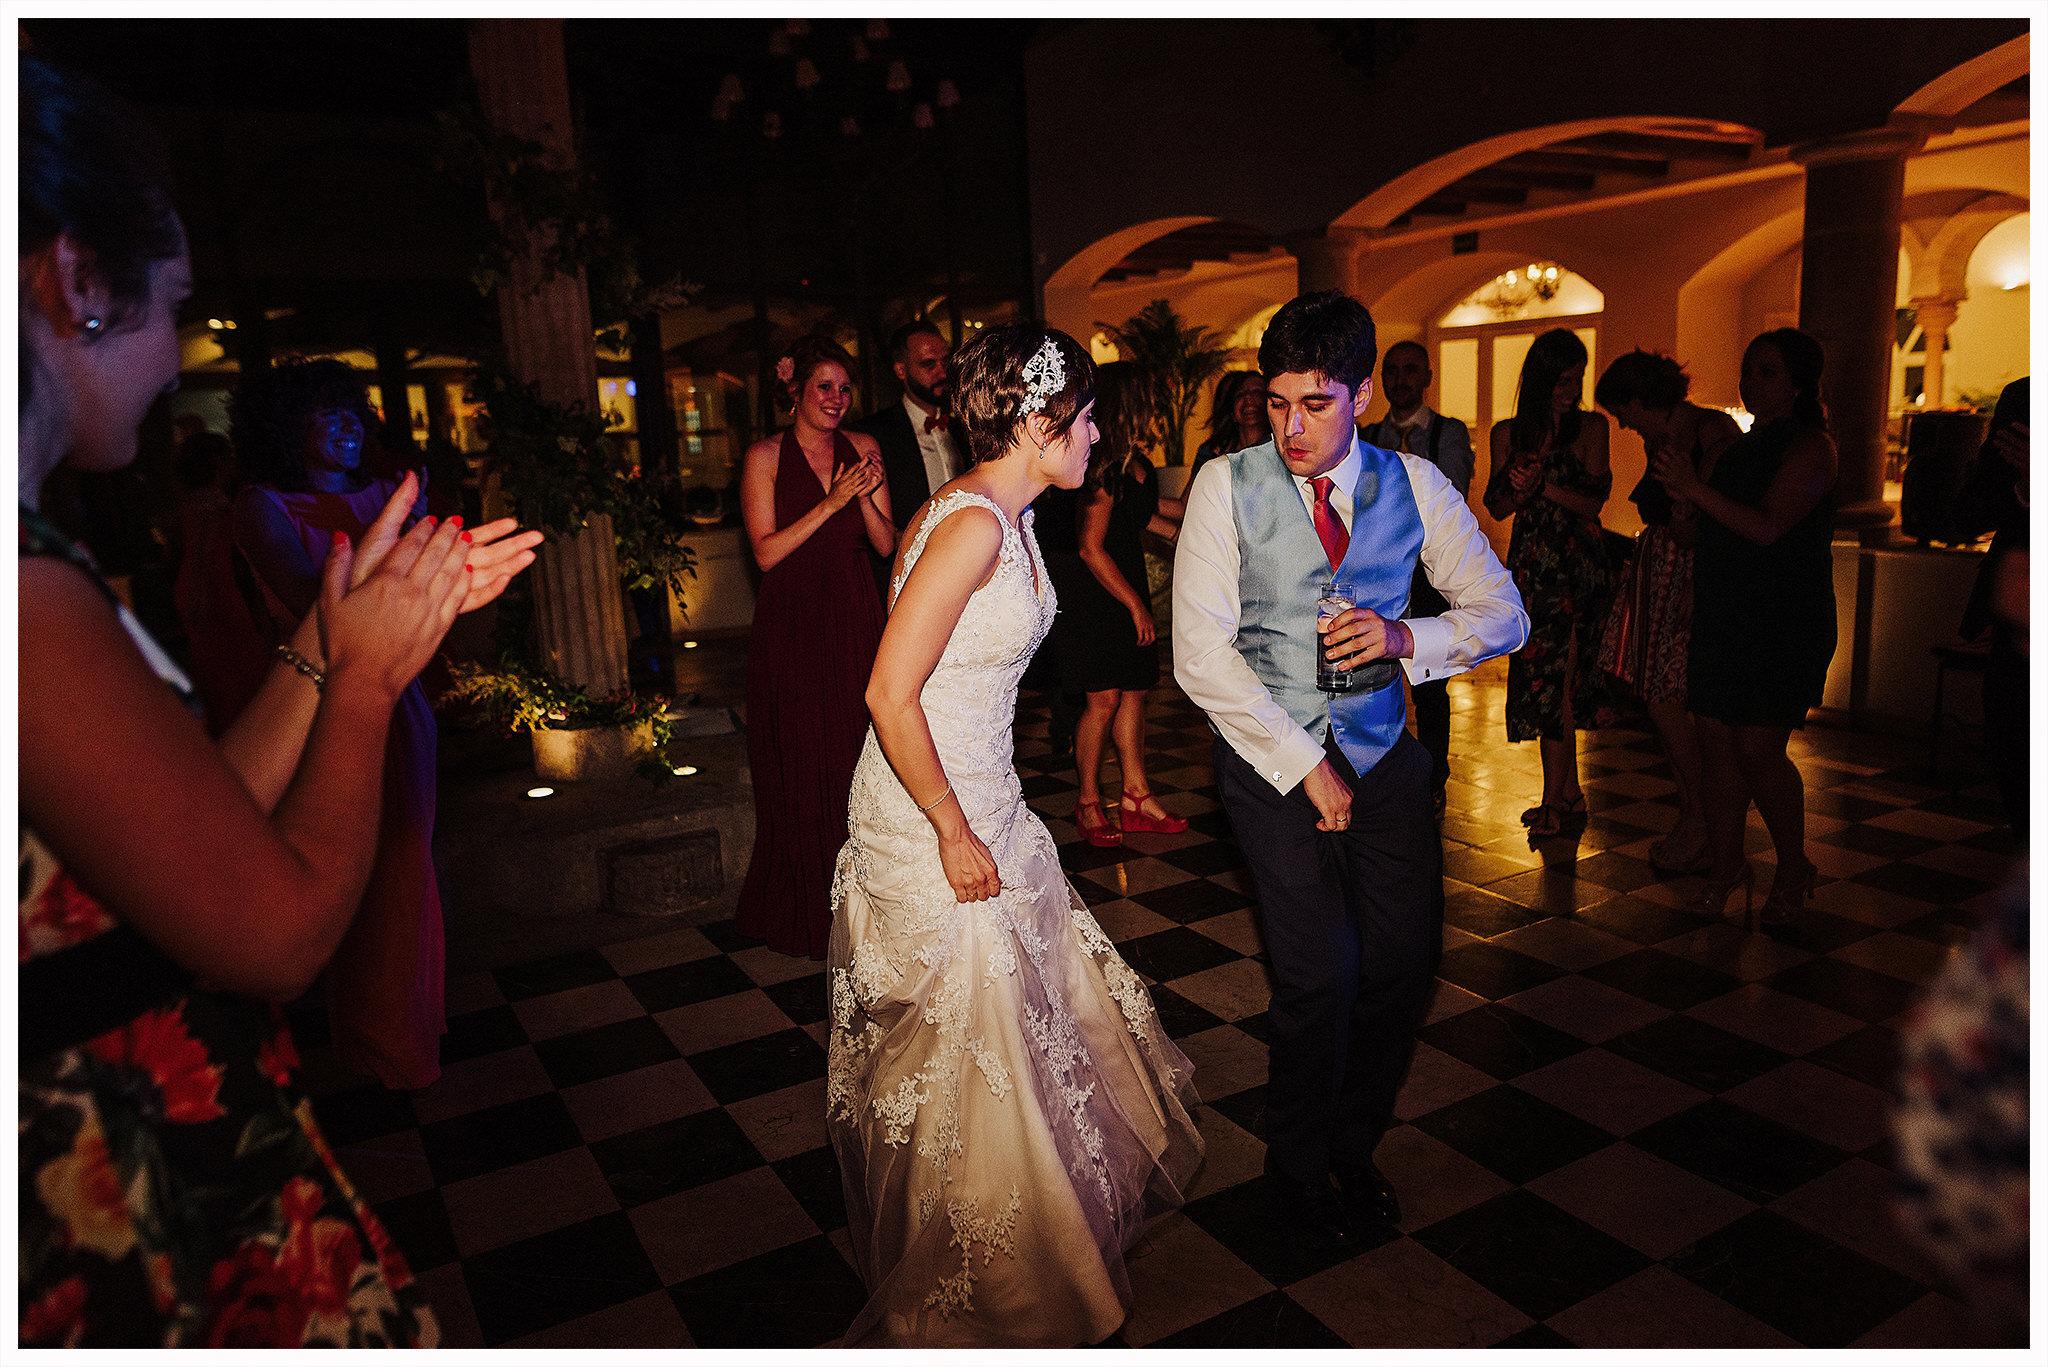 dreamsaanddreamers.com-nunta-48.jpg